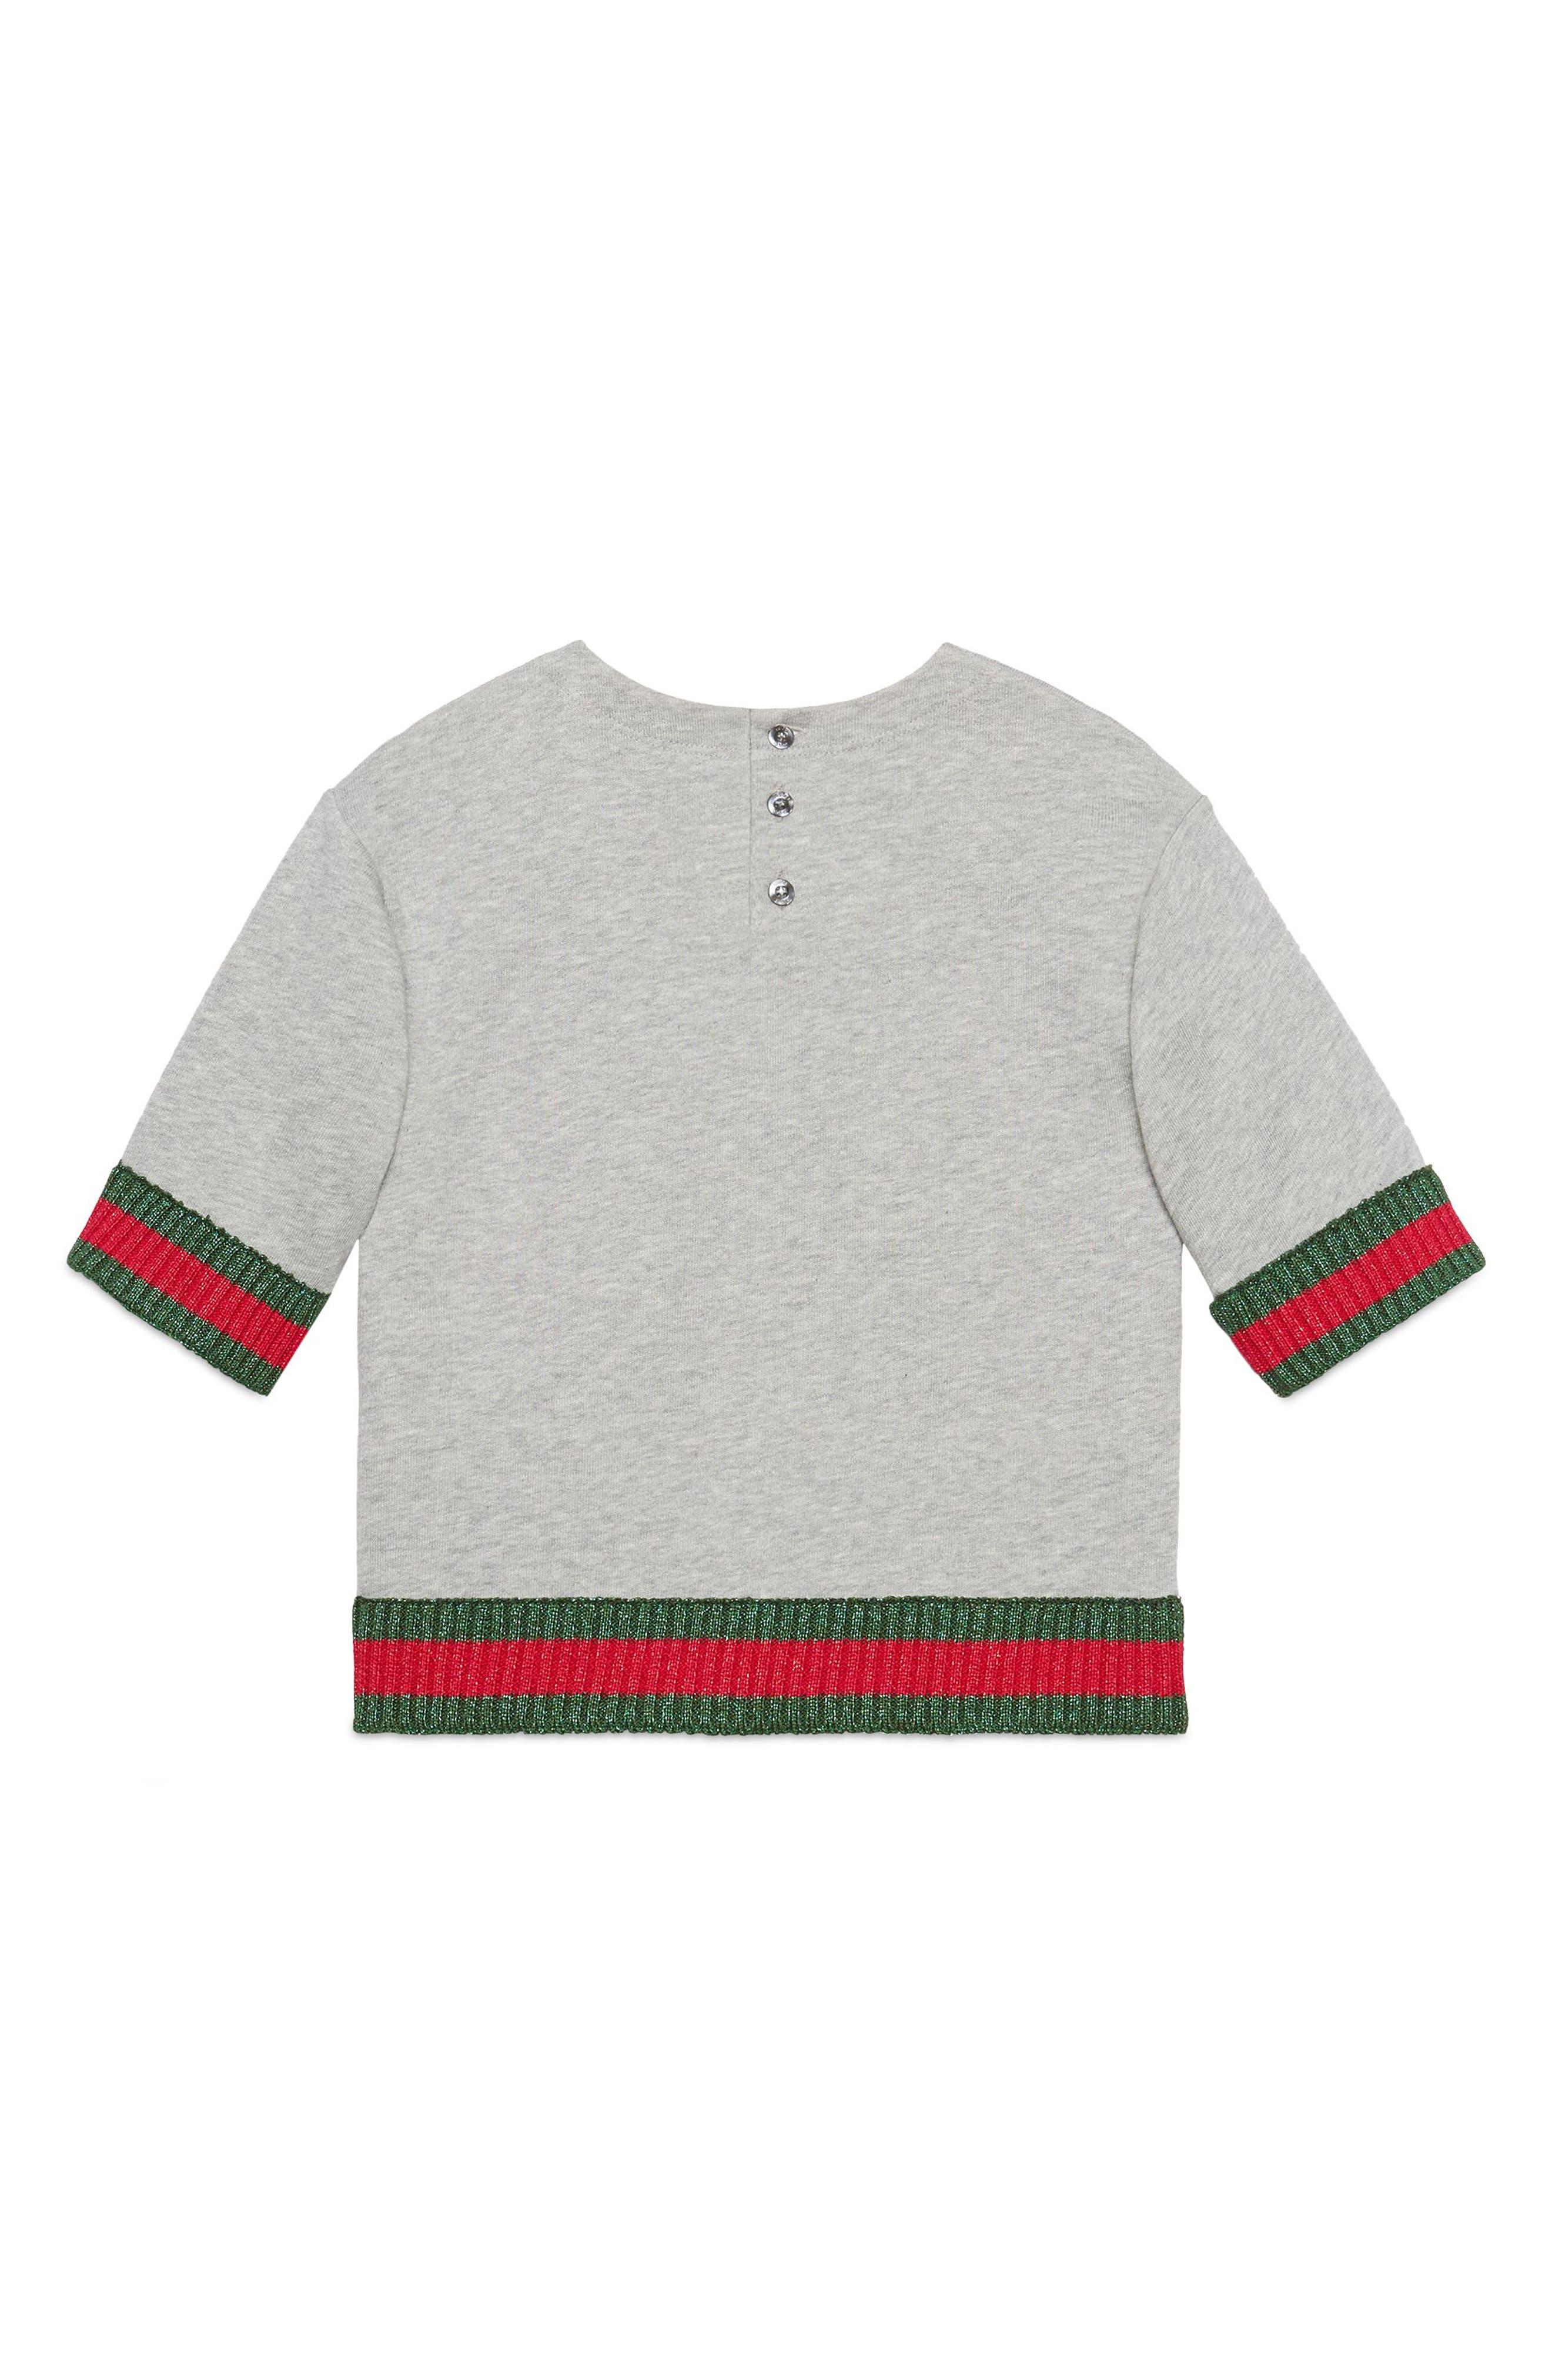 Game Patch Sweatshirt,                             Alternate thumbnail 2, color,                             L.GREY/ MULTICOLOR